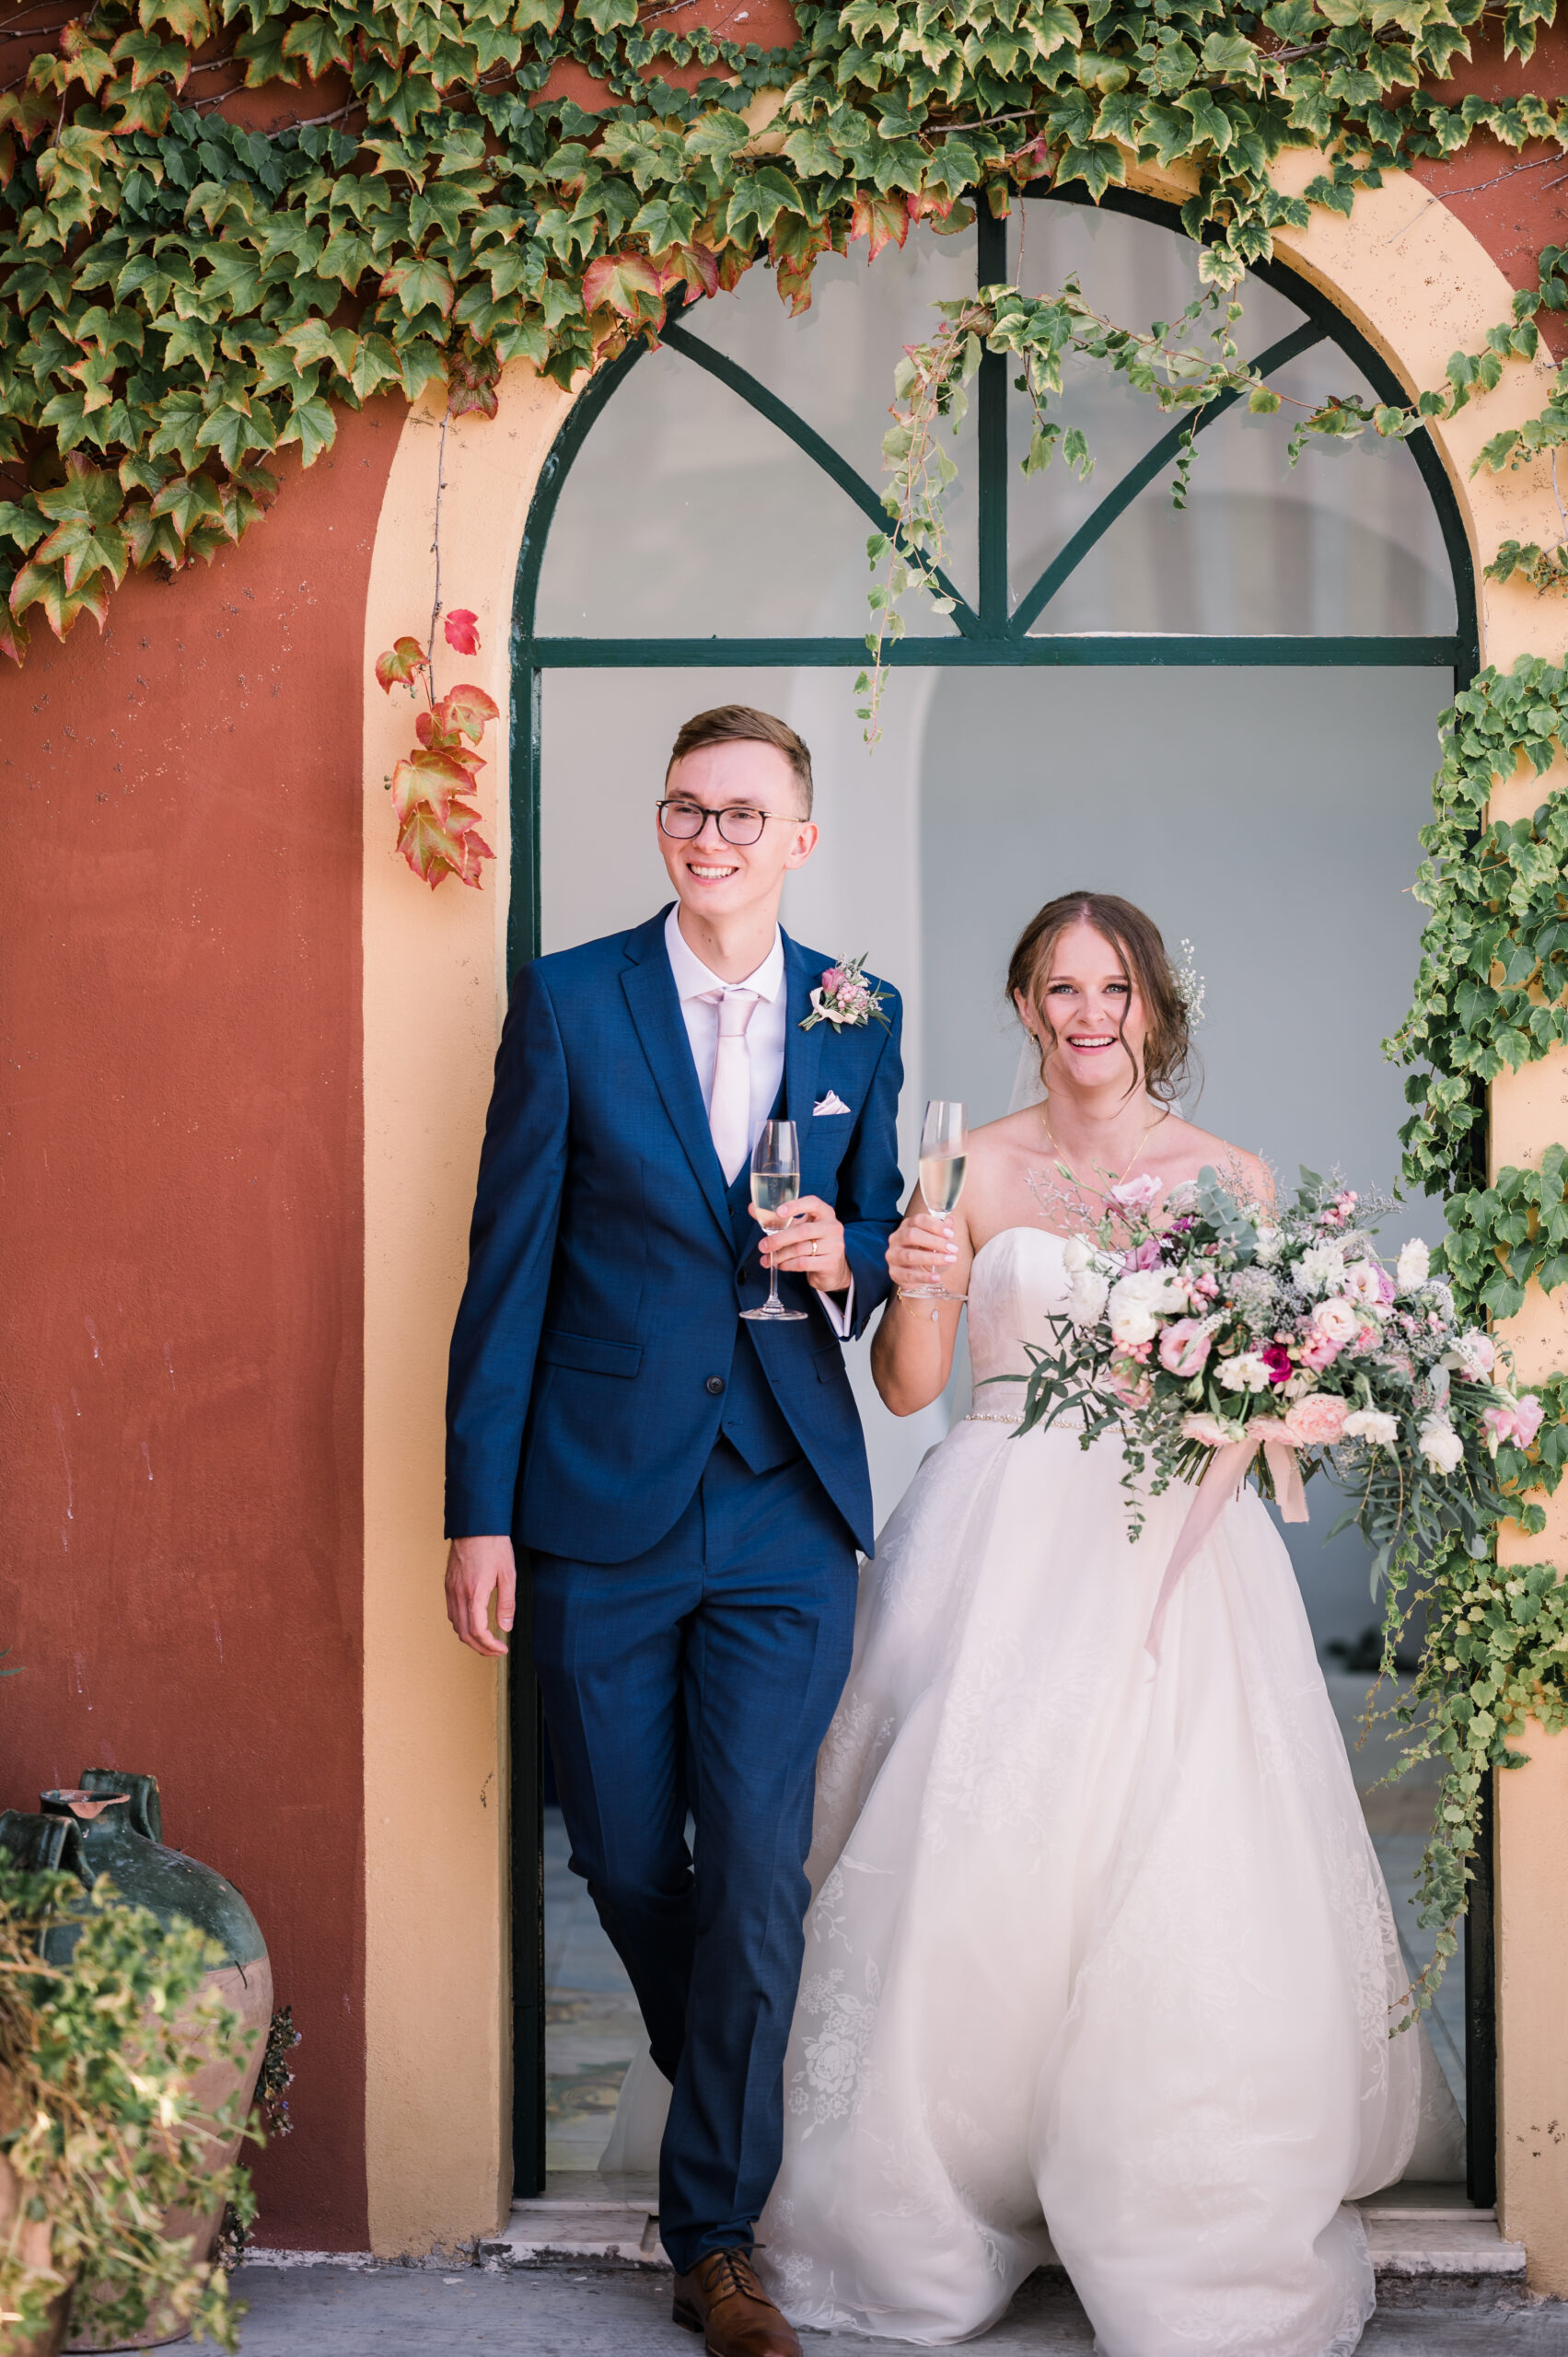 Ben and Holly wedding in Maiori, Amalfi Coast, Italy (22)